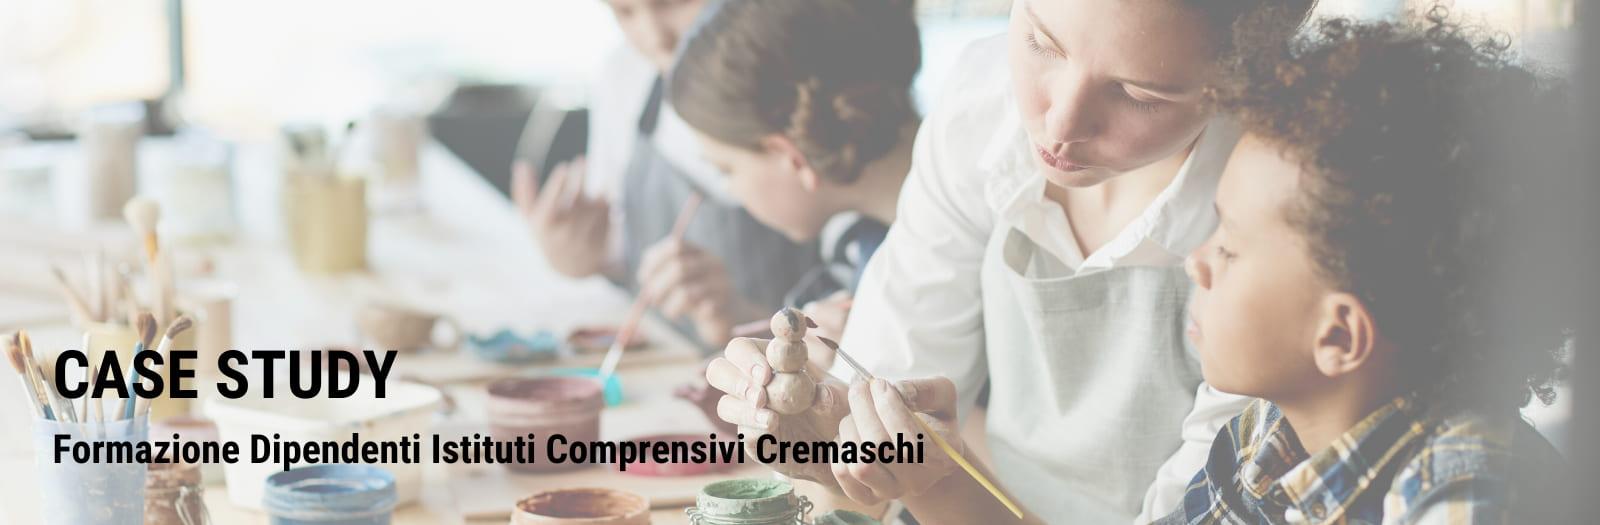 Case Study Formazione Dipendenti Istituti Comprensivi Cremaschi